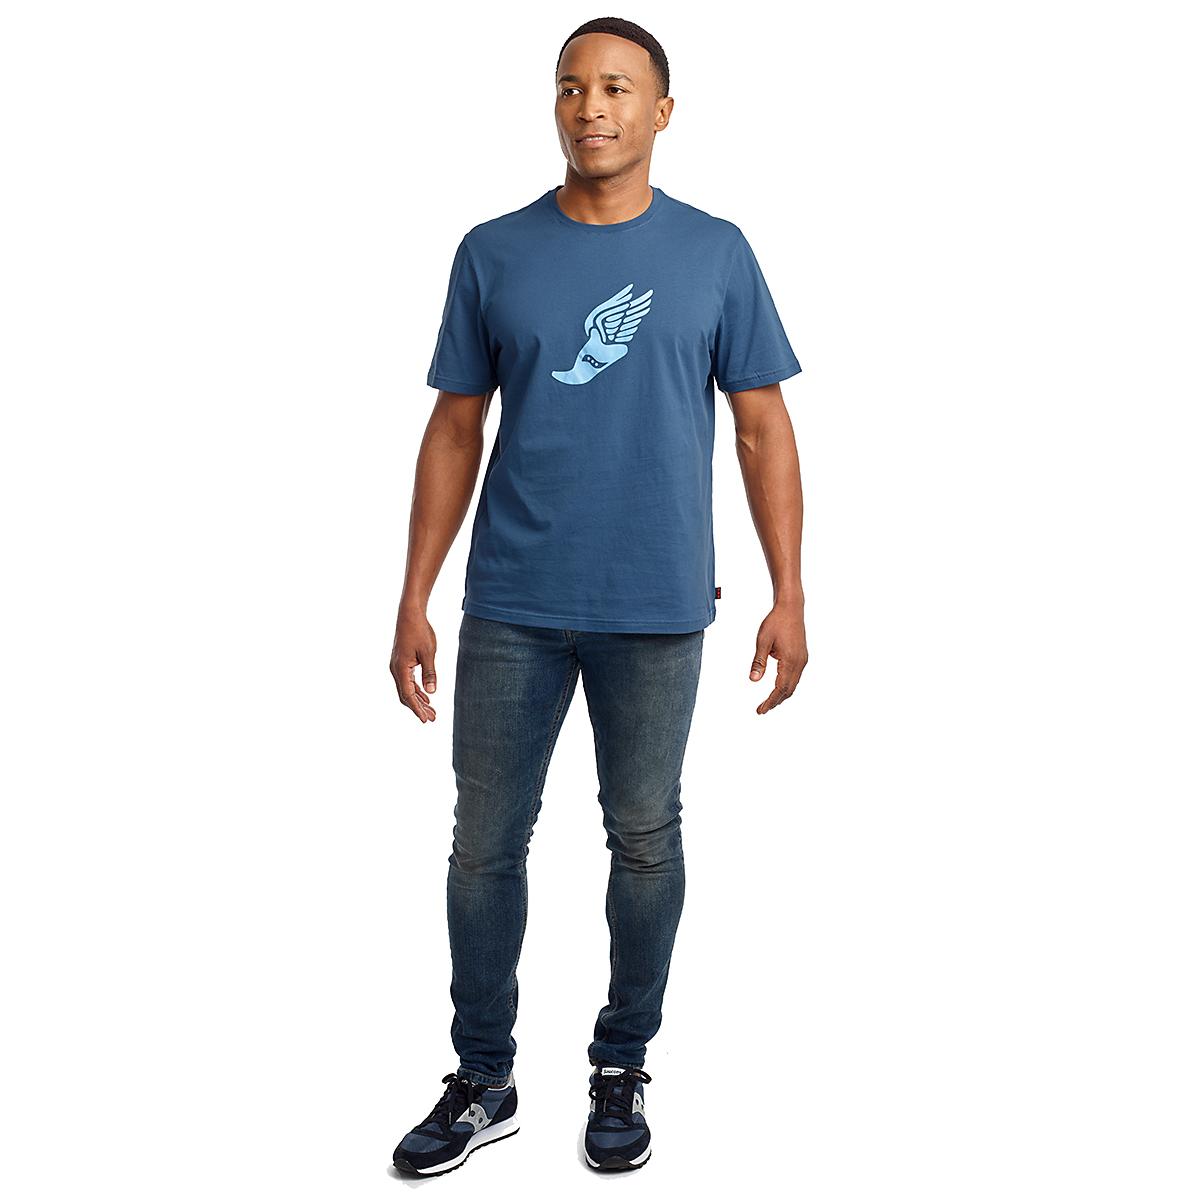 Men's Saucony Rested Short Sleeve Tee - Color: Ensign Blue - Size: S, Ensign Blue, large, image 3